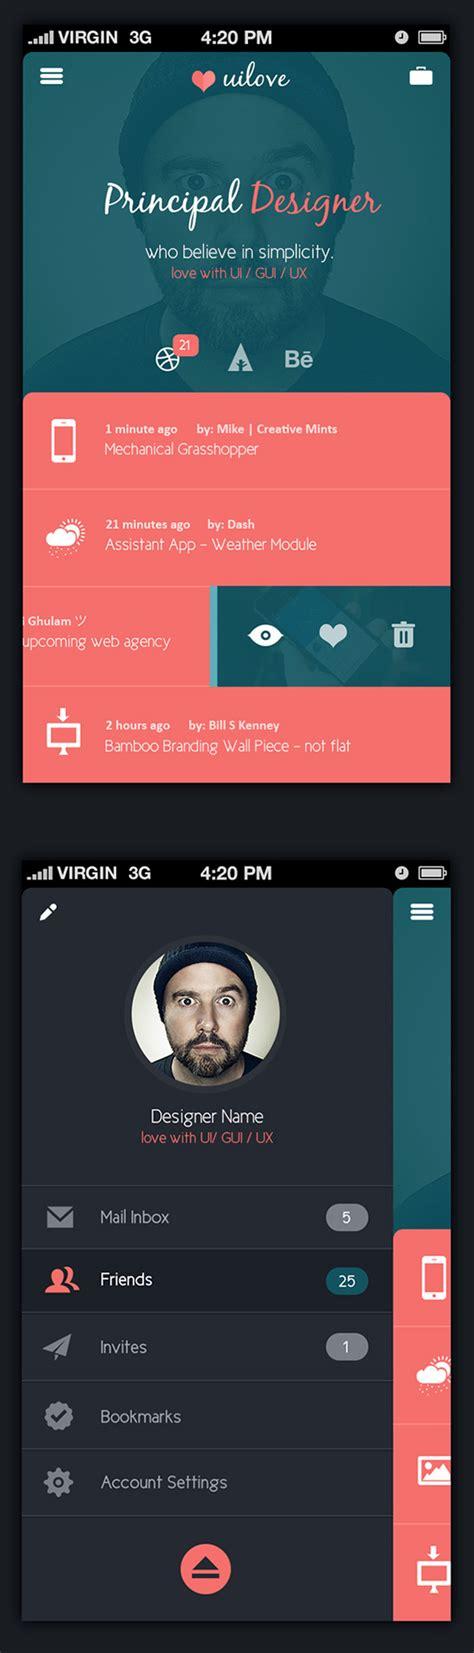 app design on behance uilove app design on behance